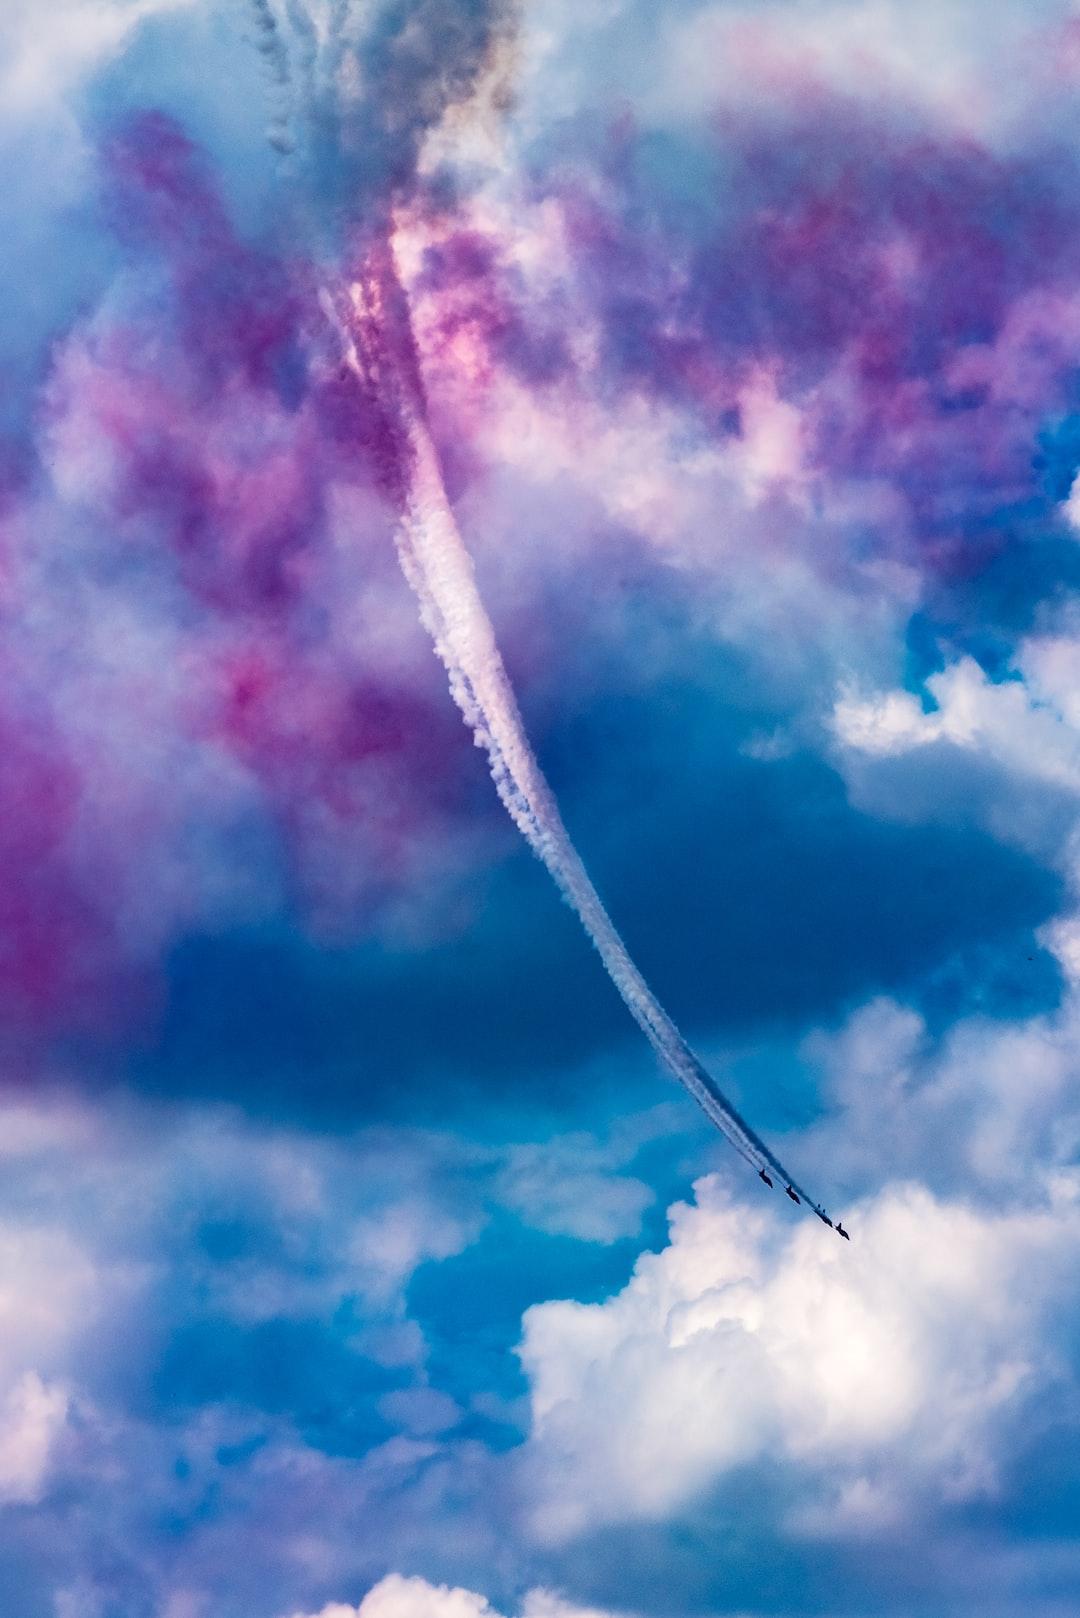 Red Arrows blasting through the sky